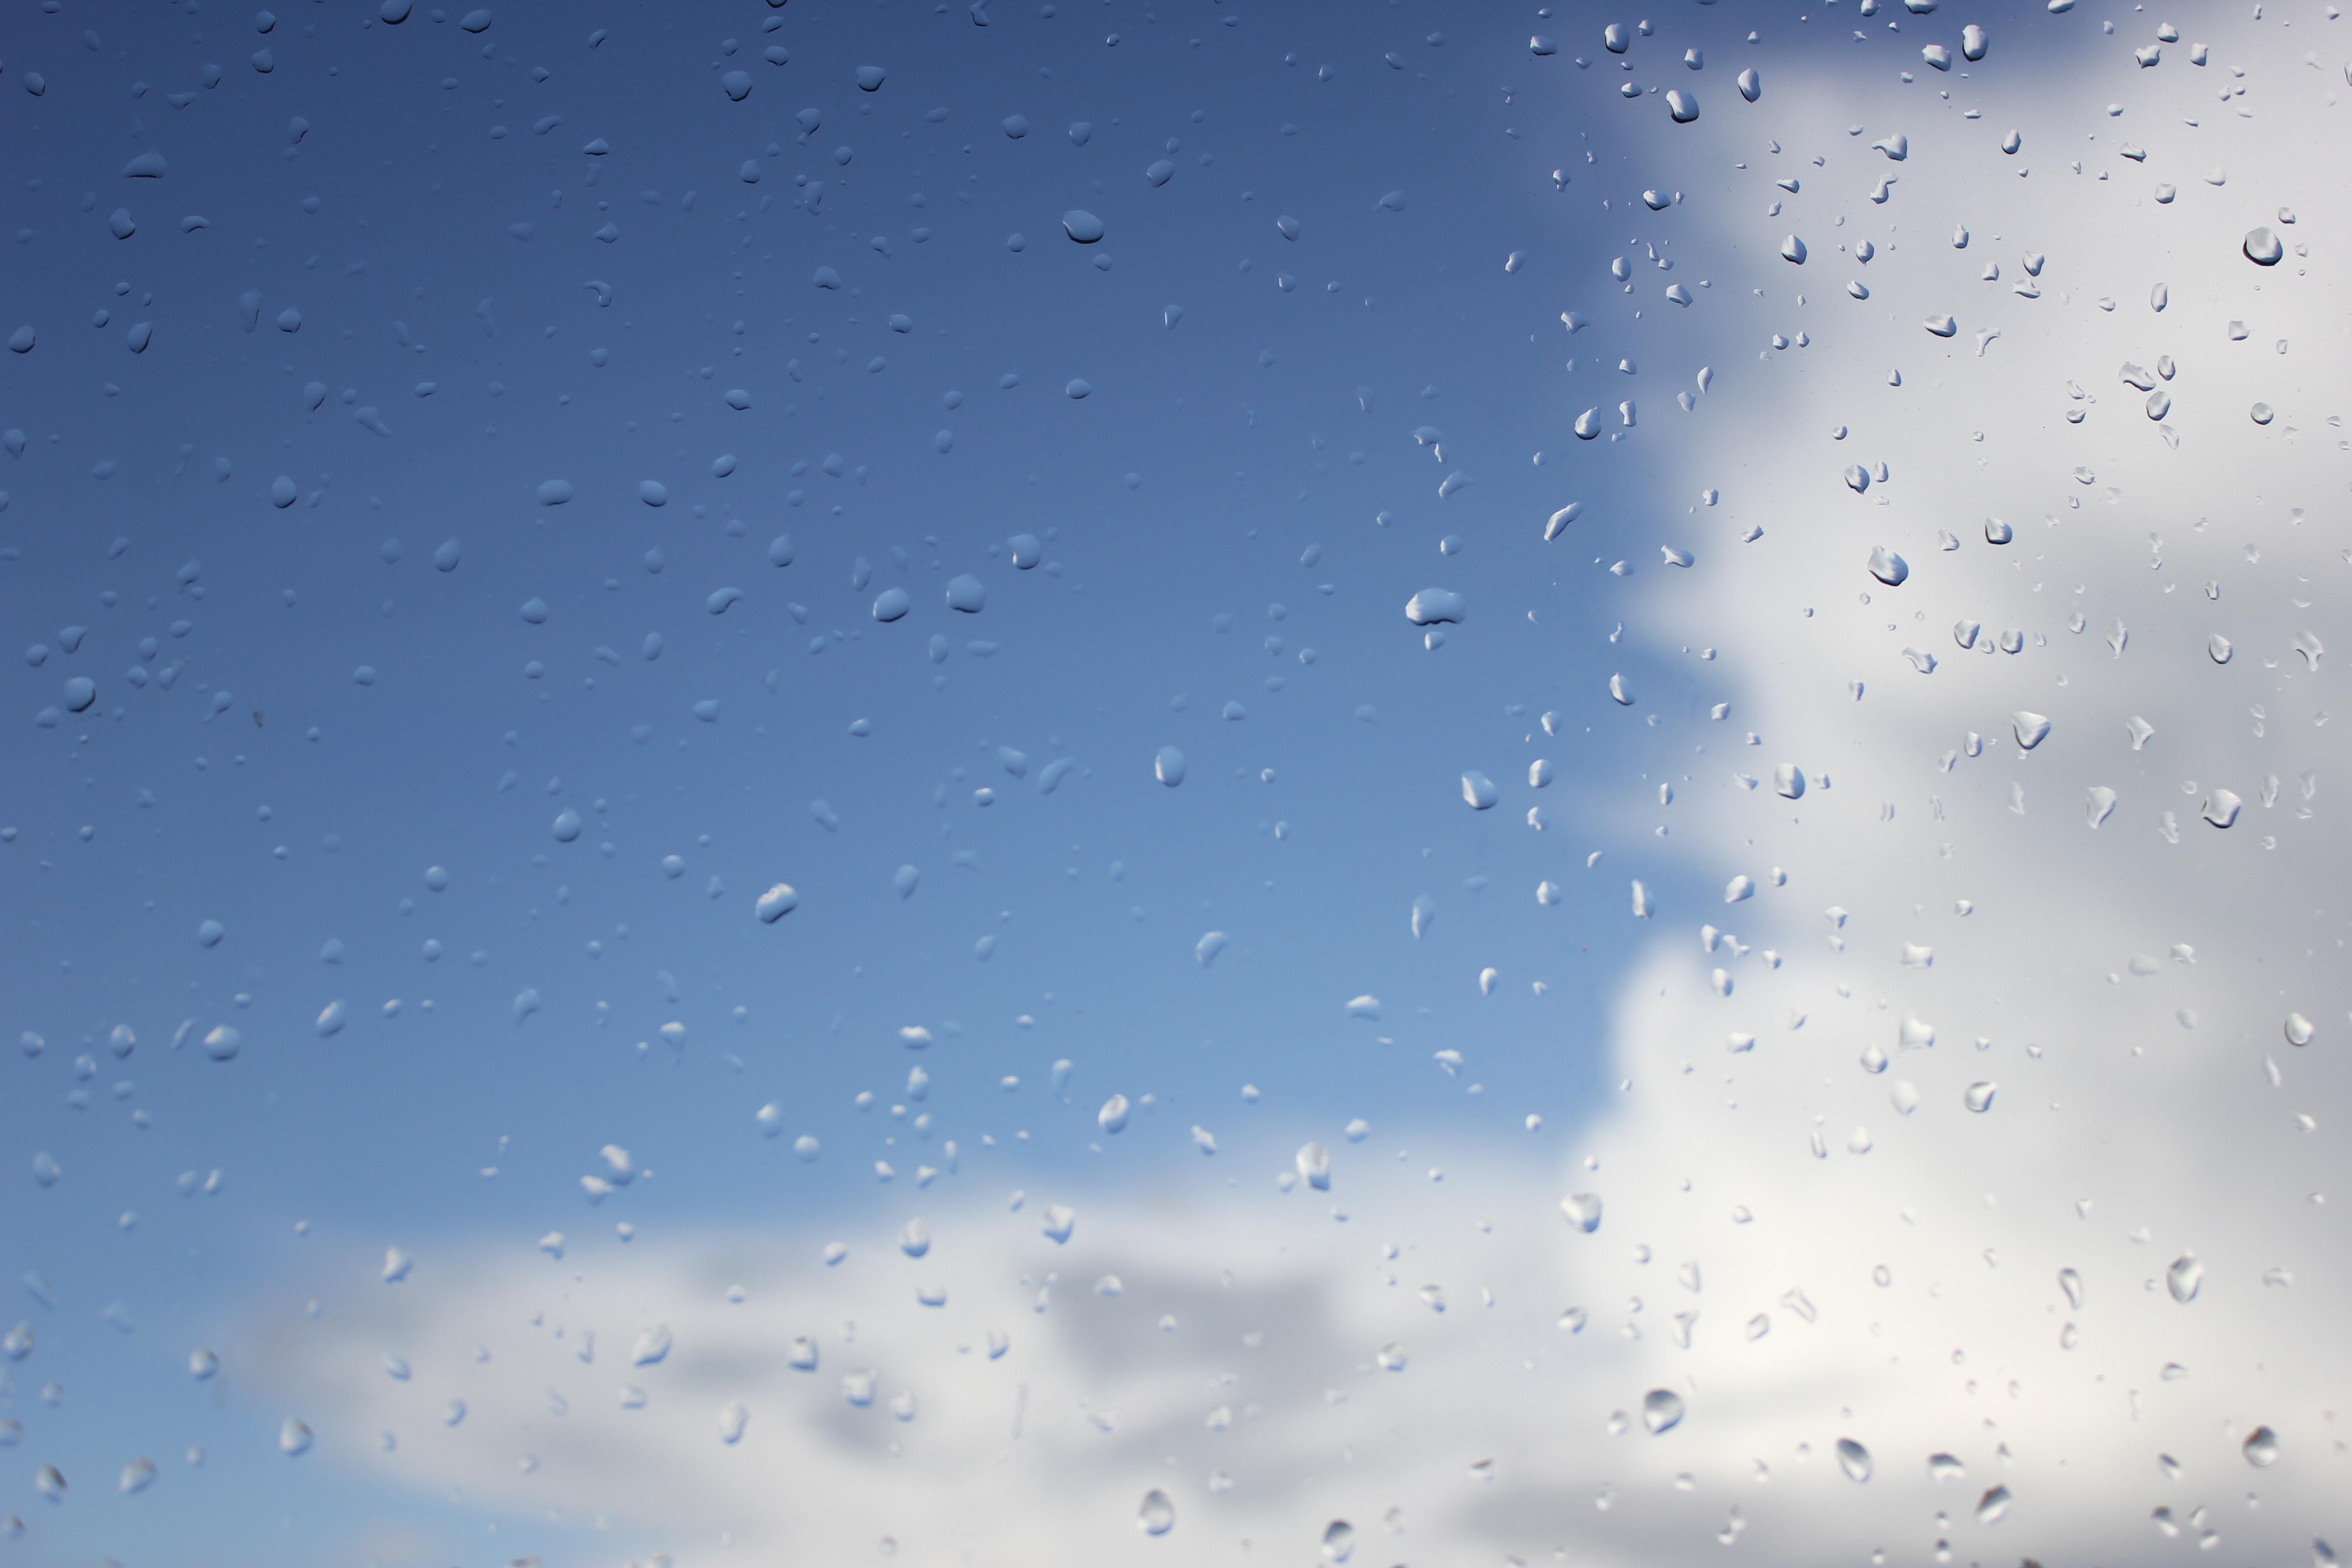 прелести небо сентября (26)